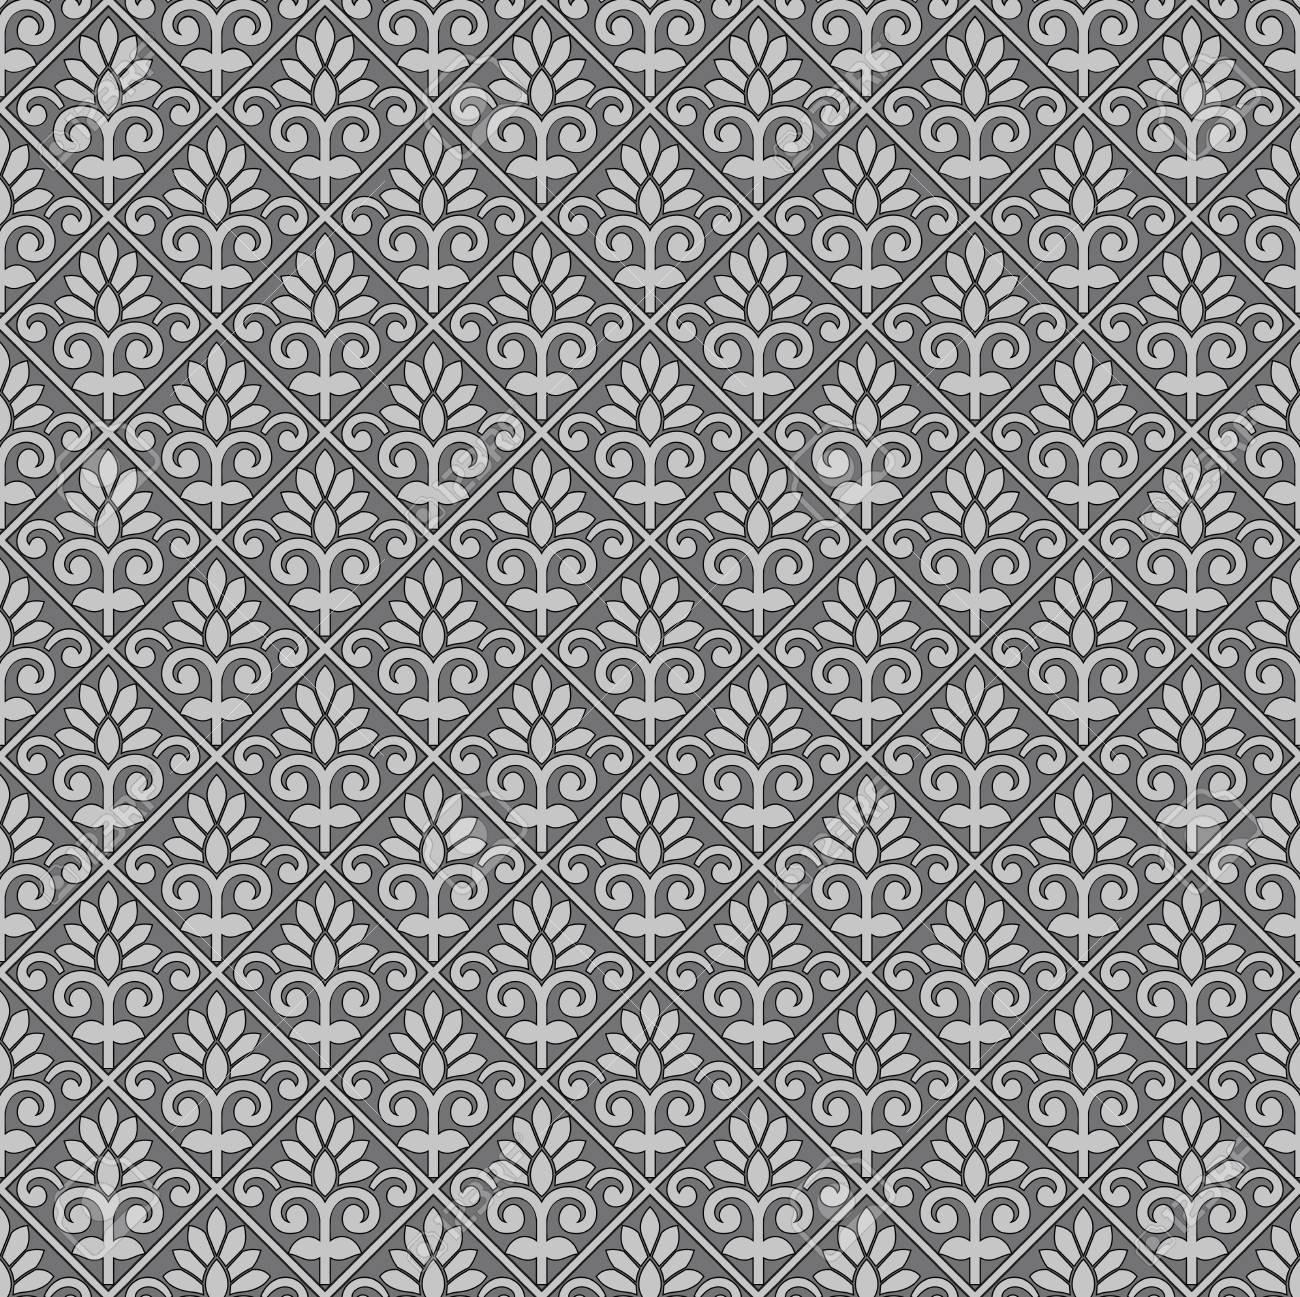 Seamless Rich Grey Damask Wallpaper Template Vector Illustration